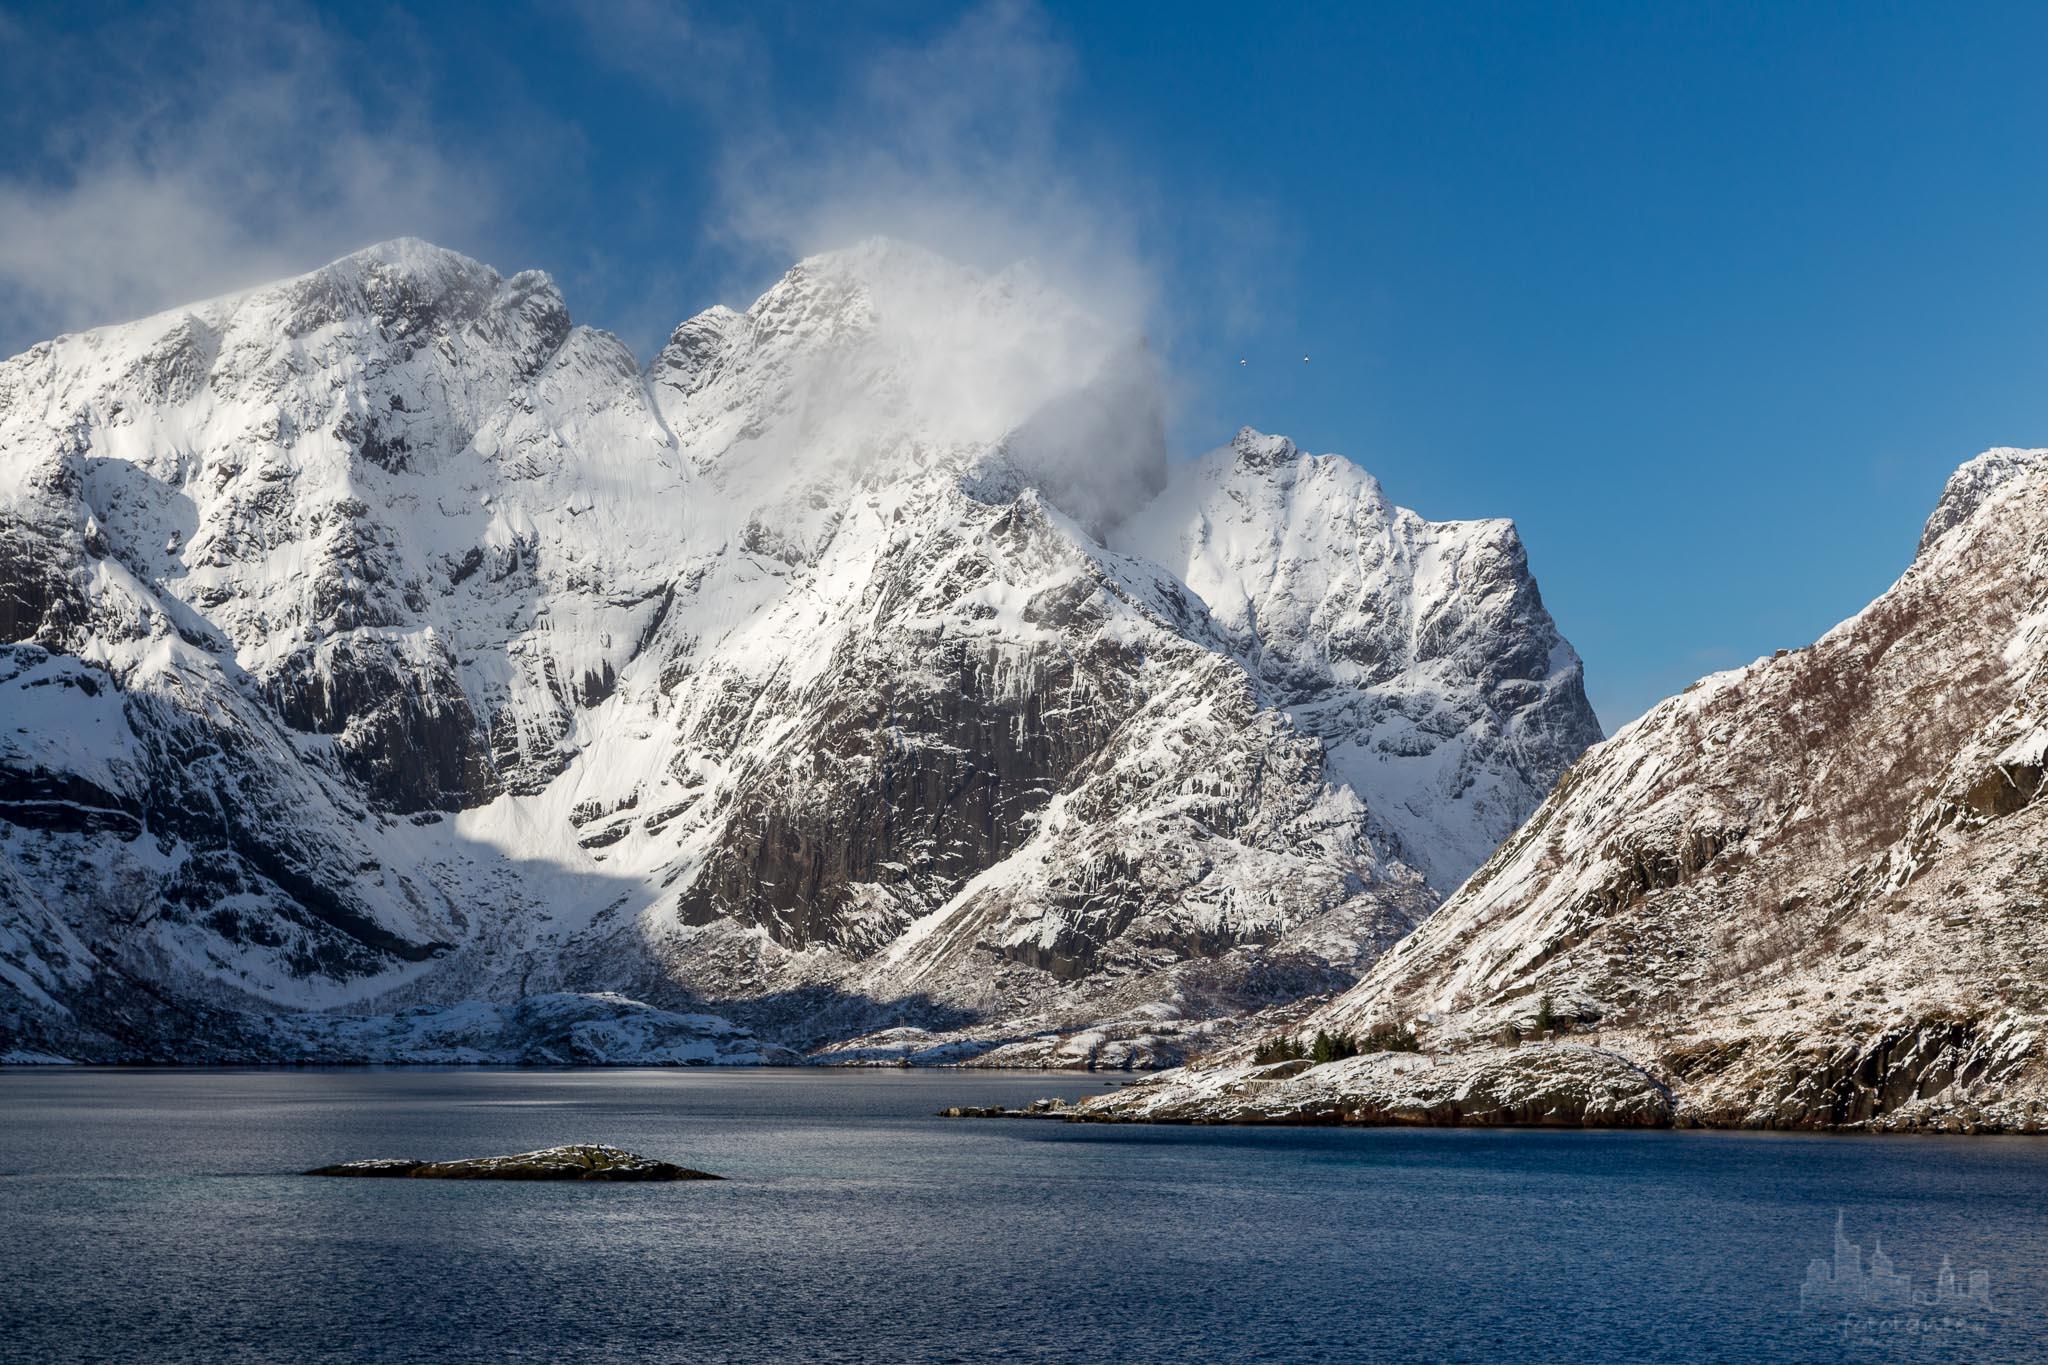 Hamnøy's best view, Lofoten, Norway